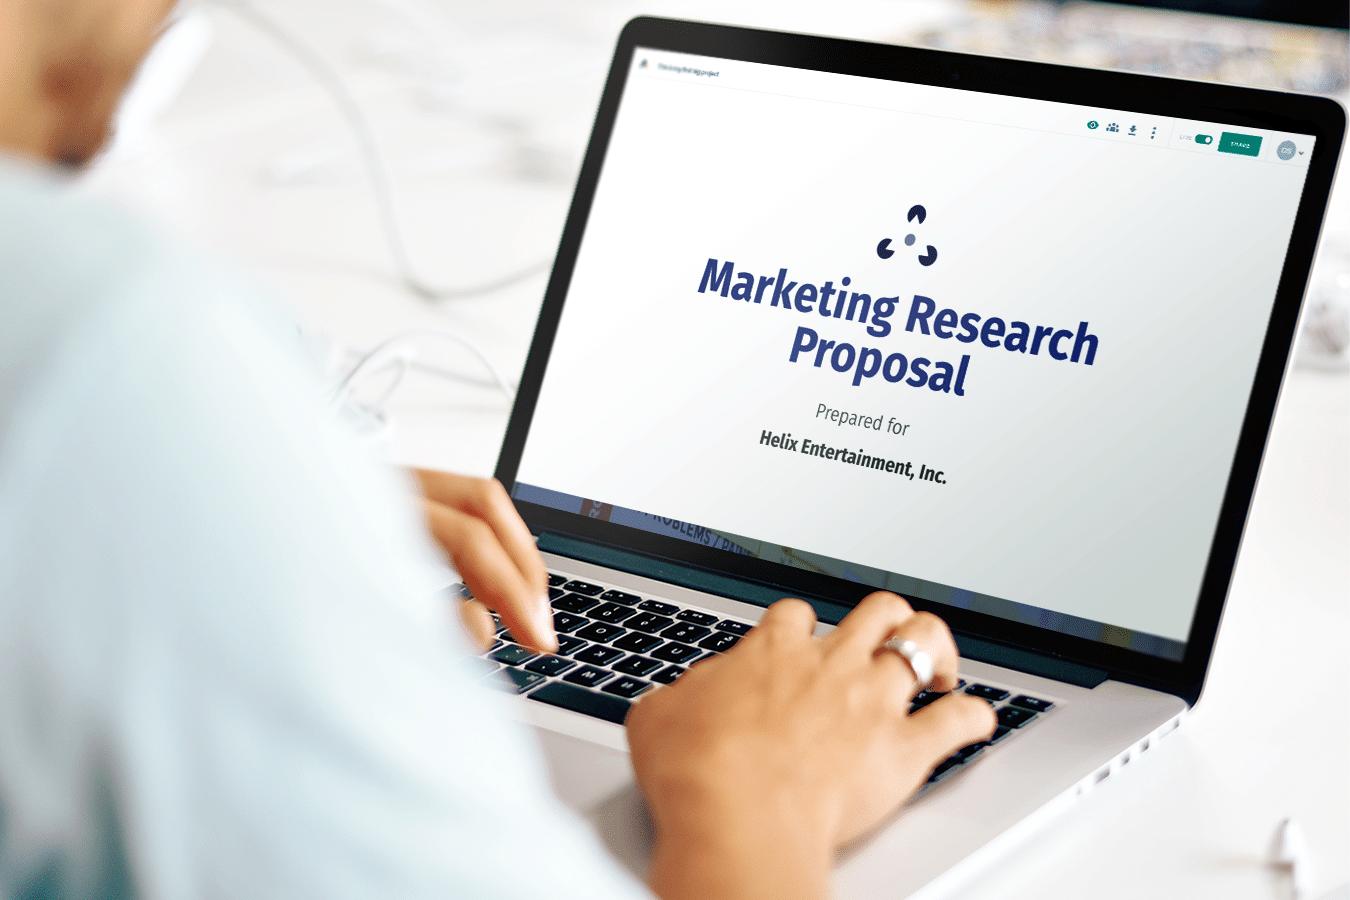 marketing-research-proposal-template-desktop